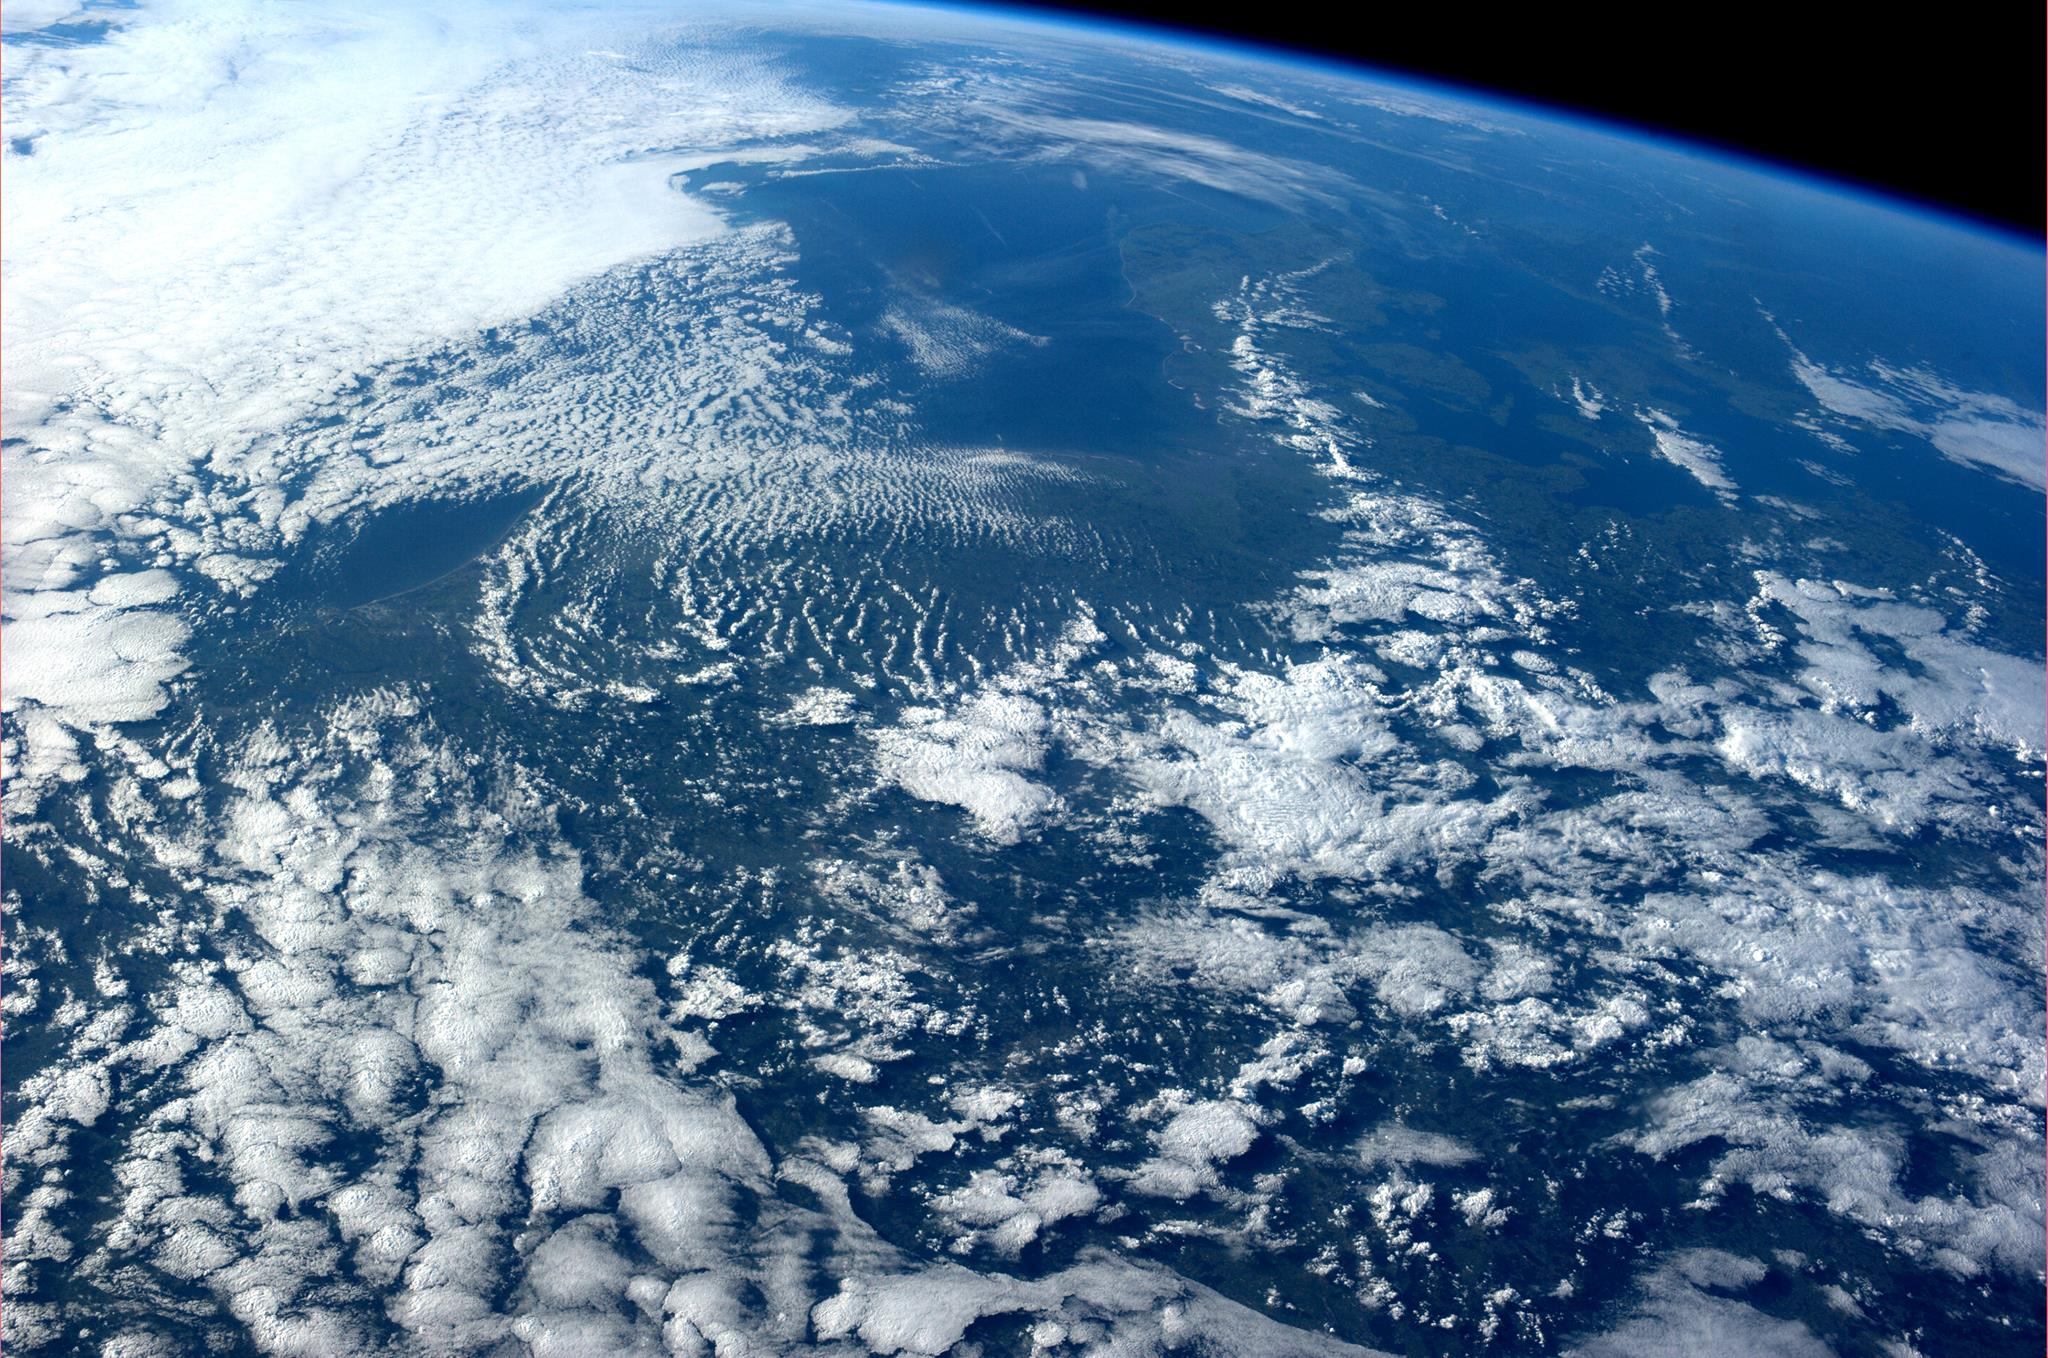 Photos astronaut Alexander Gerst 14